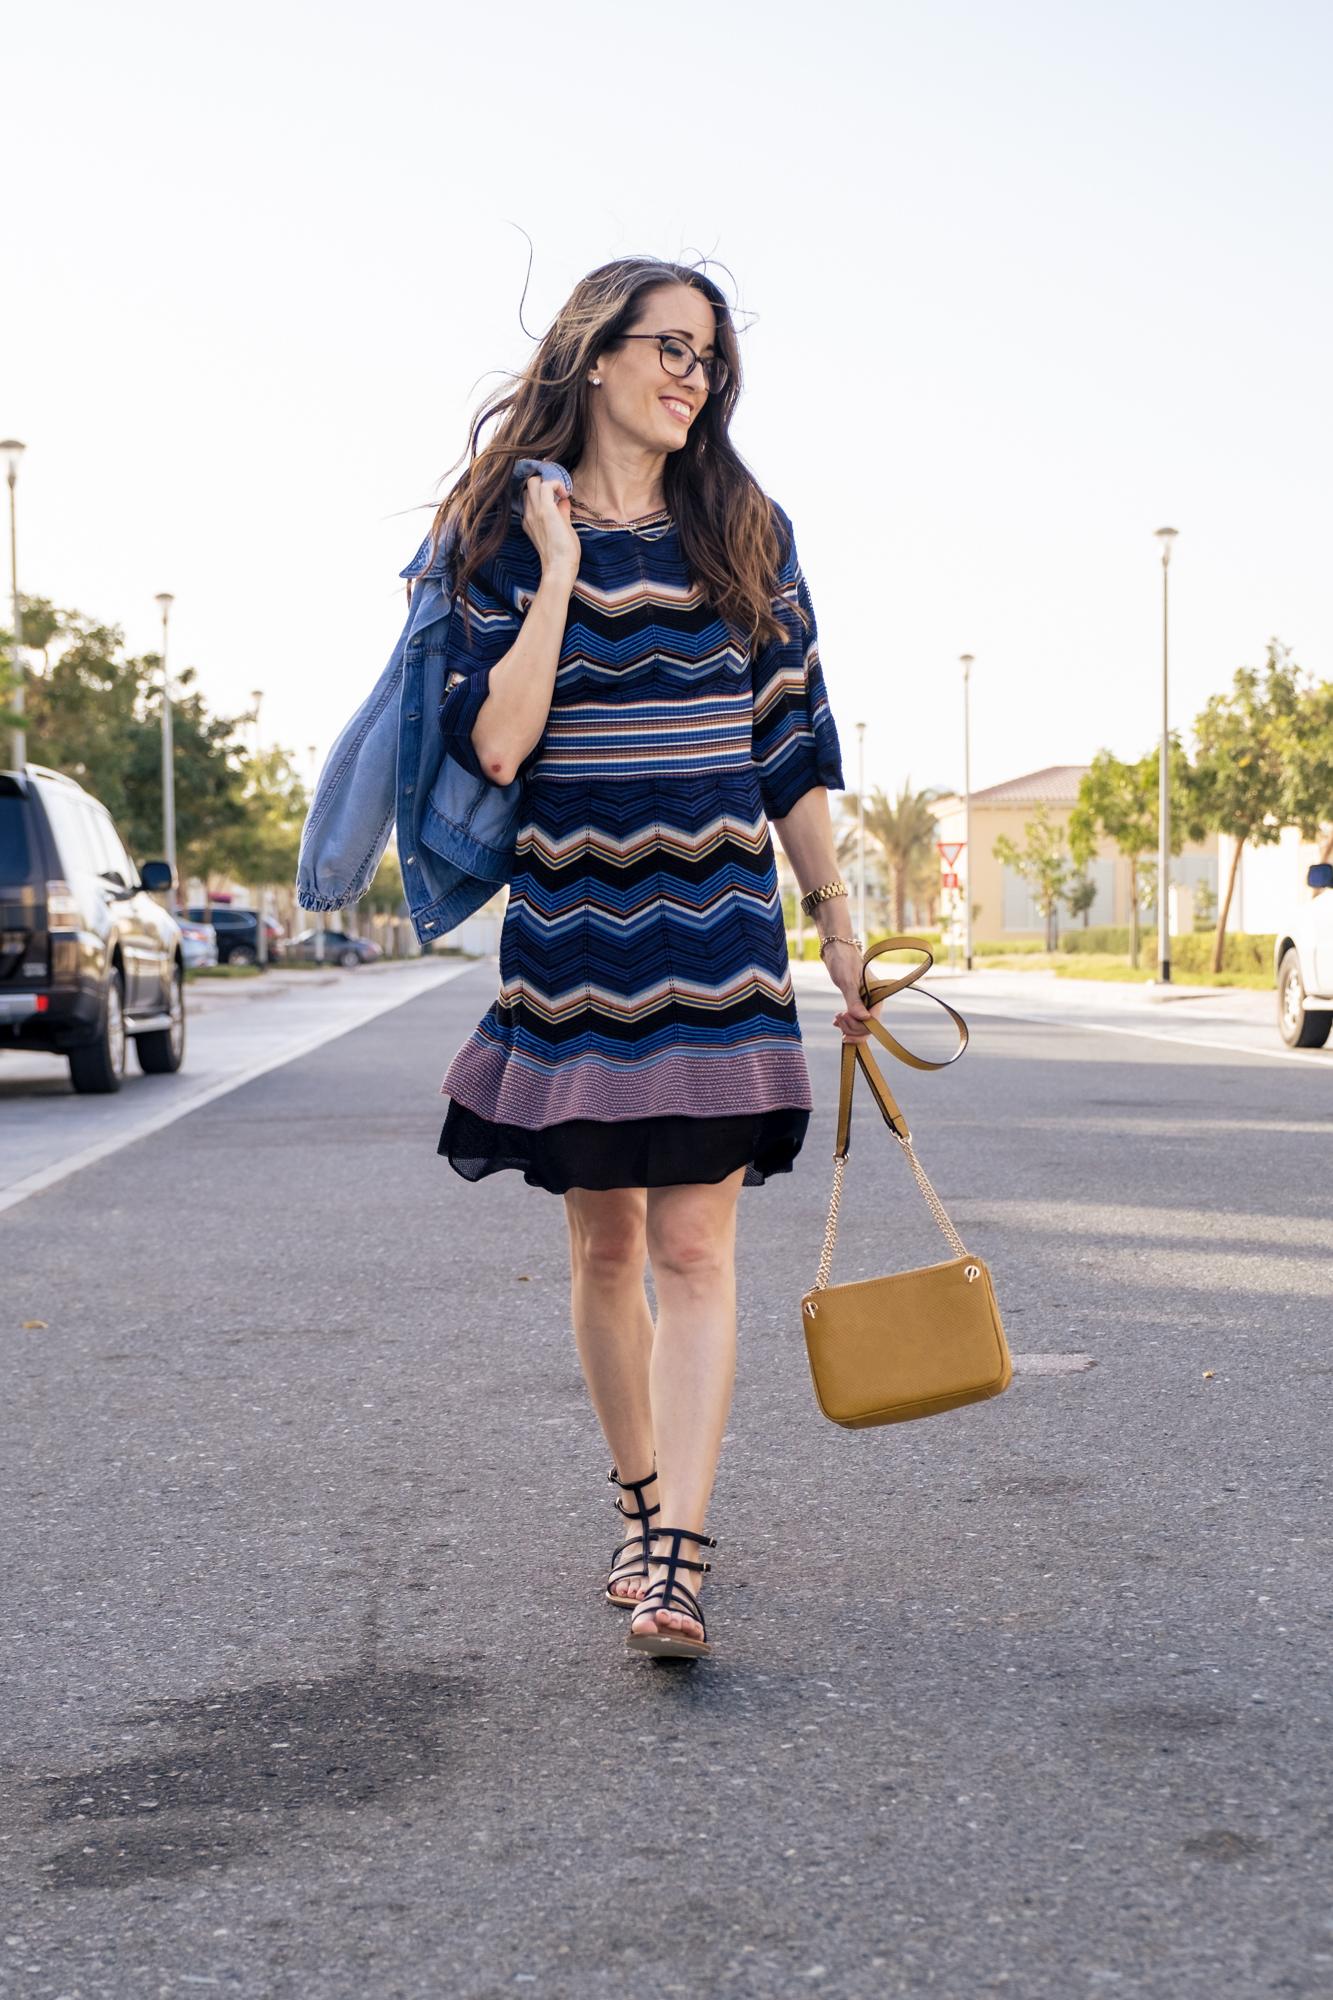 walking on the street towards the camera in a zig zag print dress